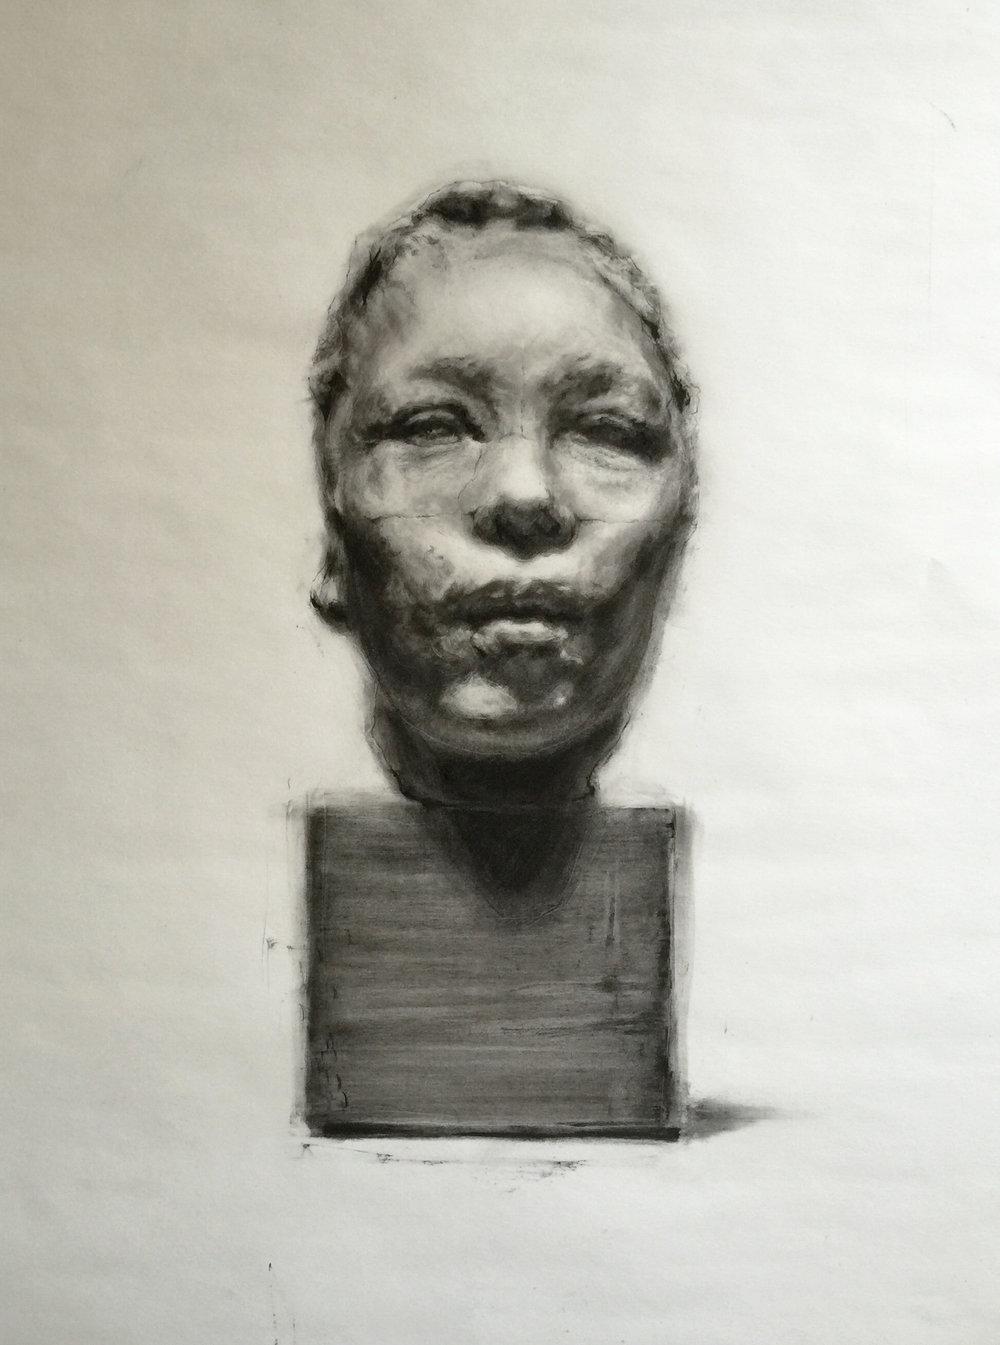 Agnes_Grochulska_Synthesis_Hanako_1_charcoal_18x24.JPG